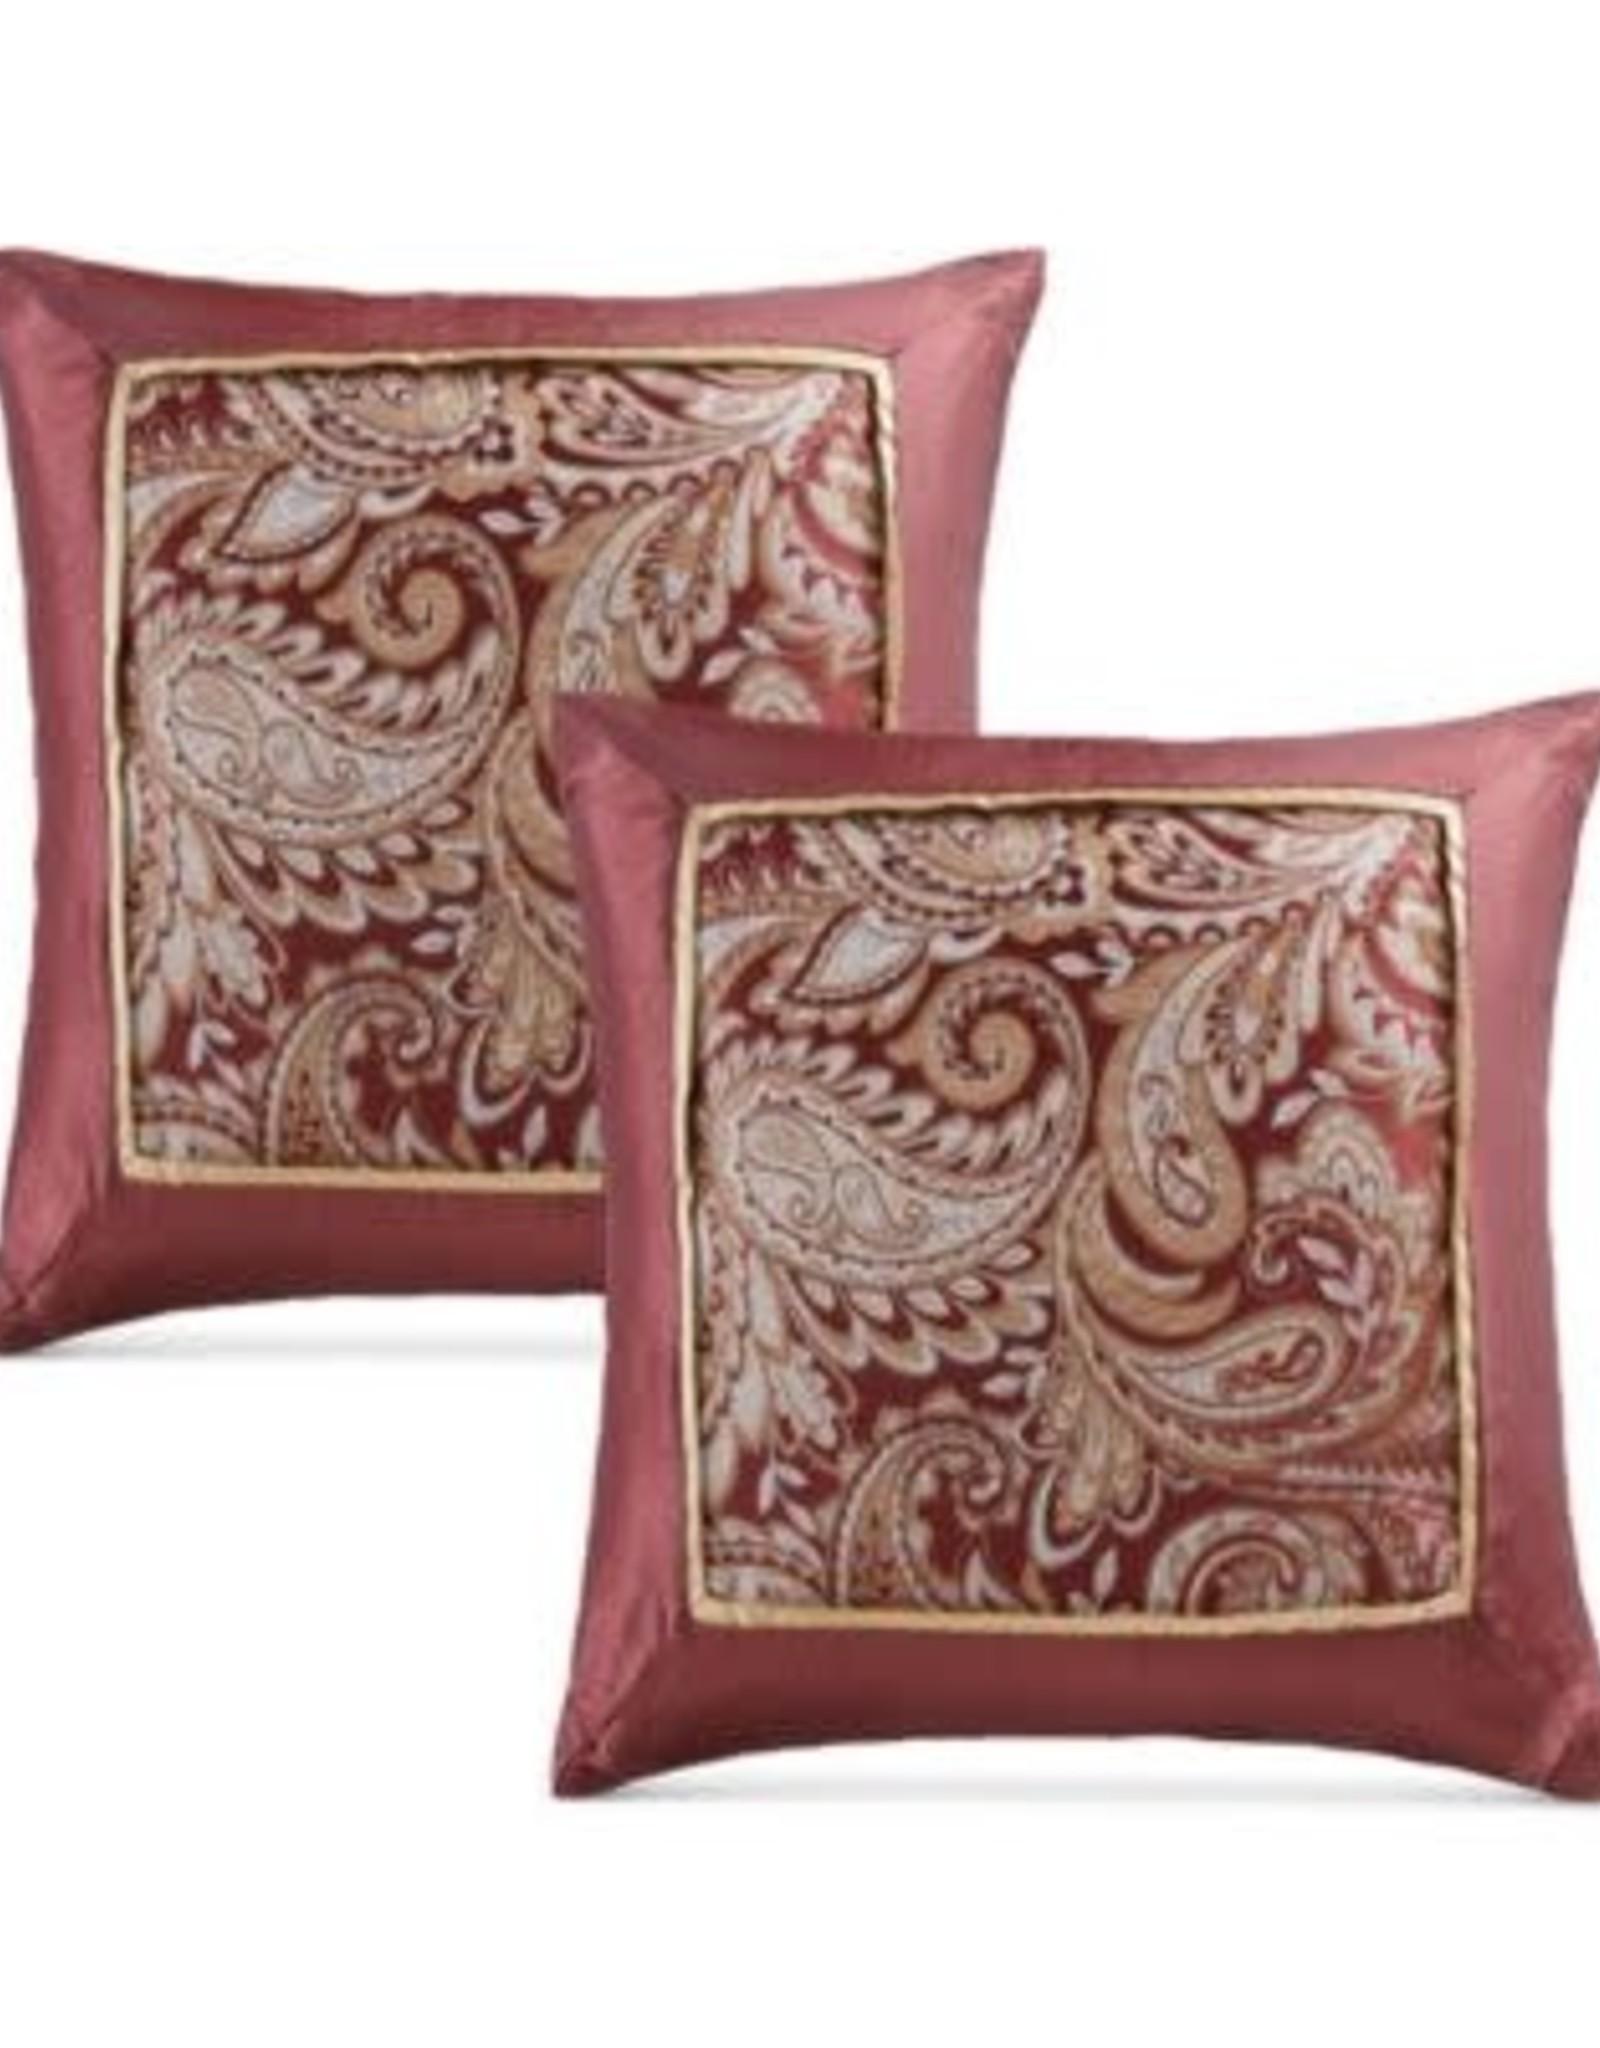 JLA Home 2 Pack ABUREY 20X20 Throw Pillows